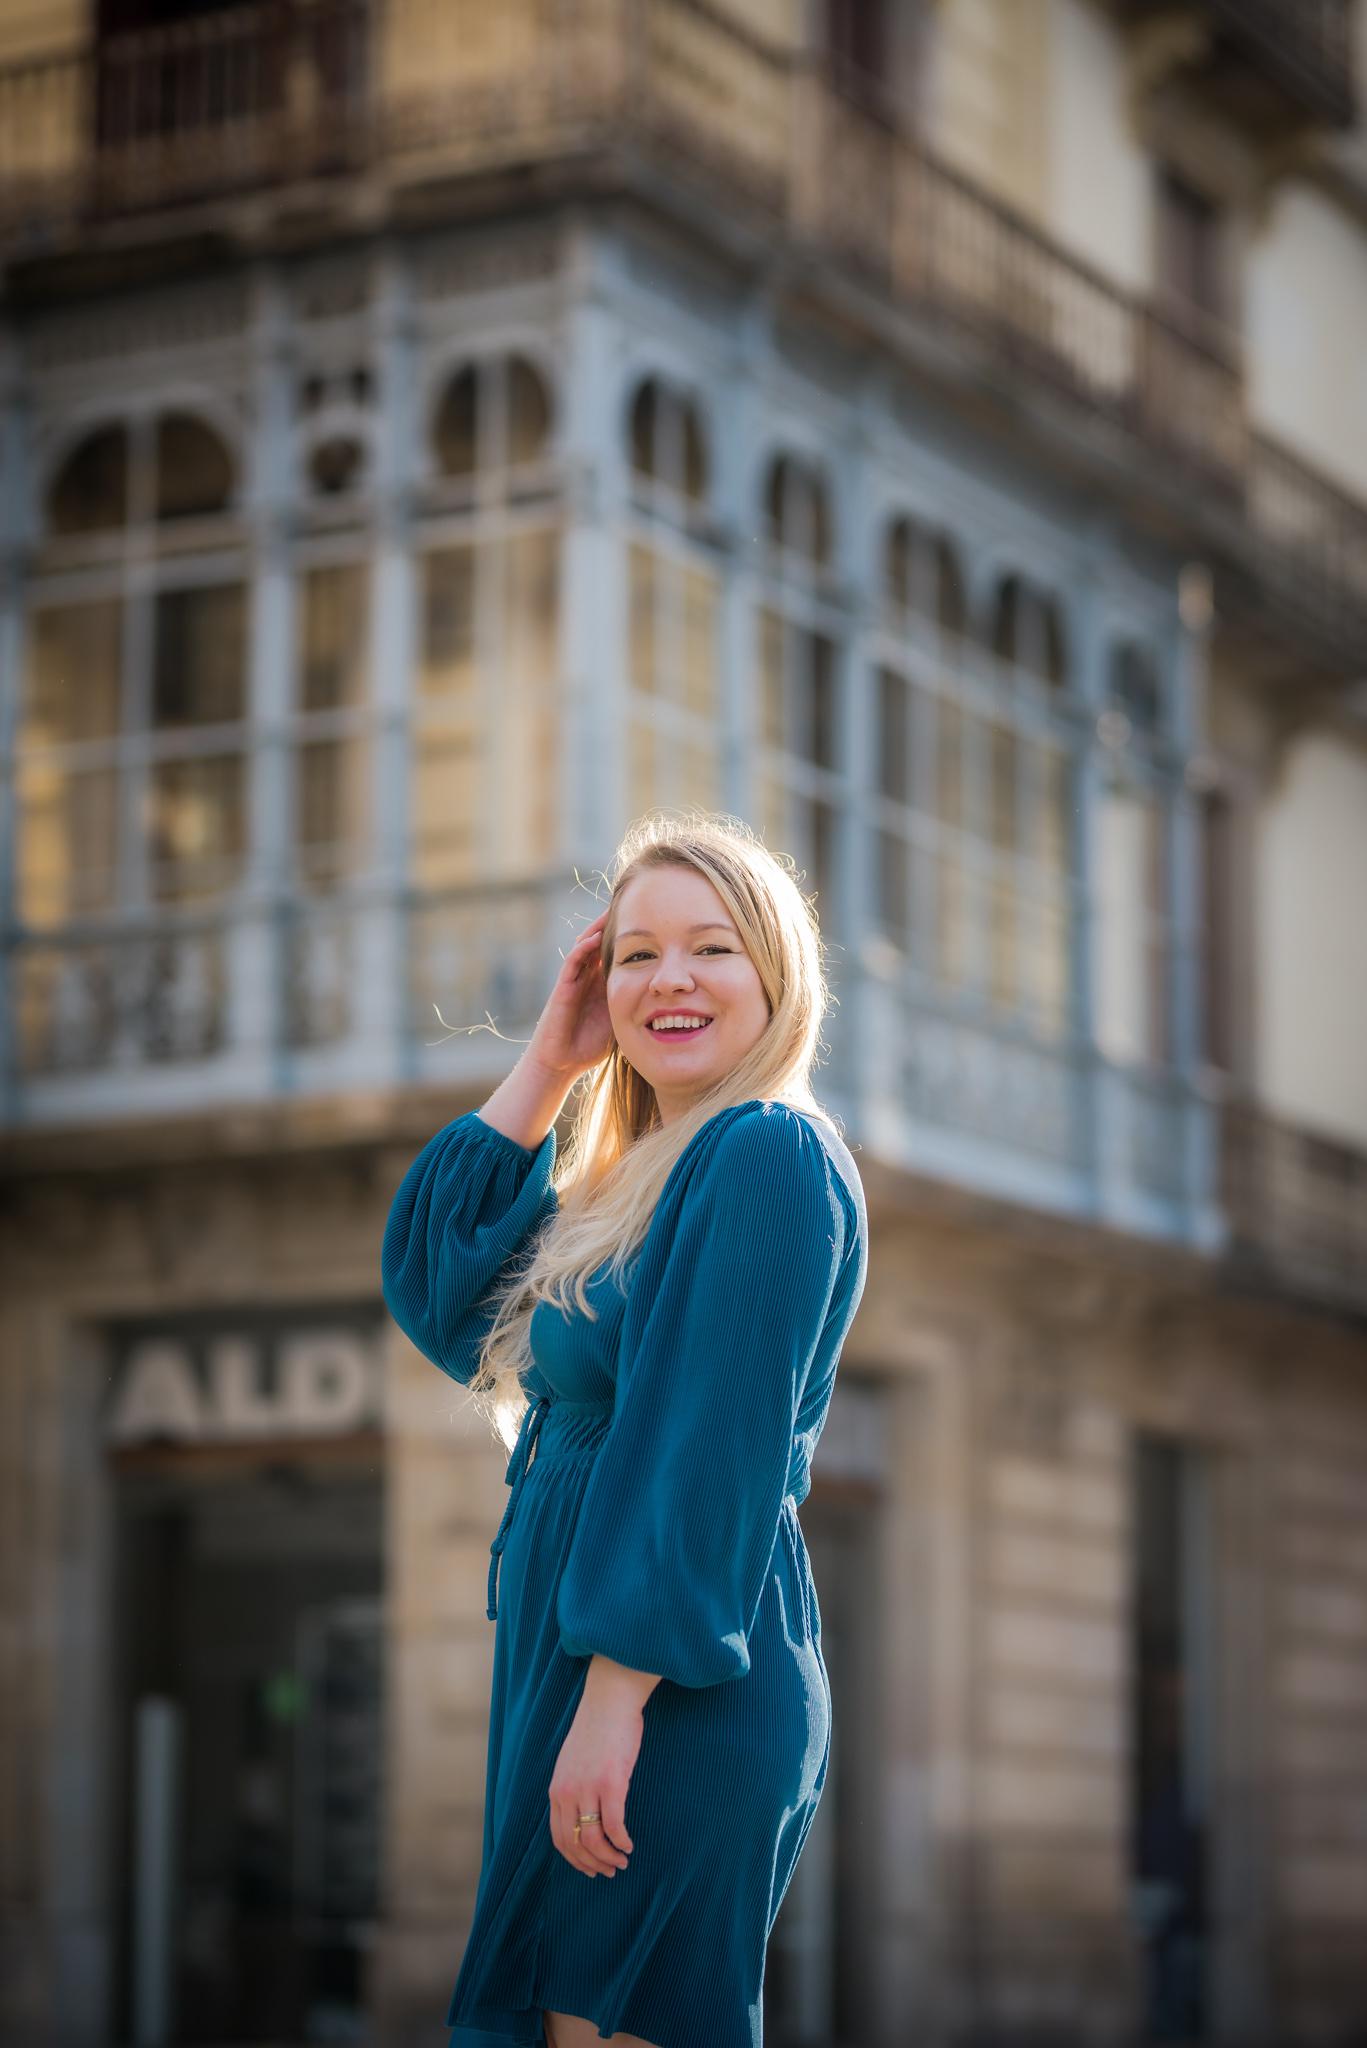 Intrepid Emma smiling in Barcelona